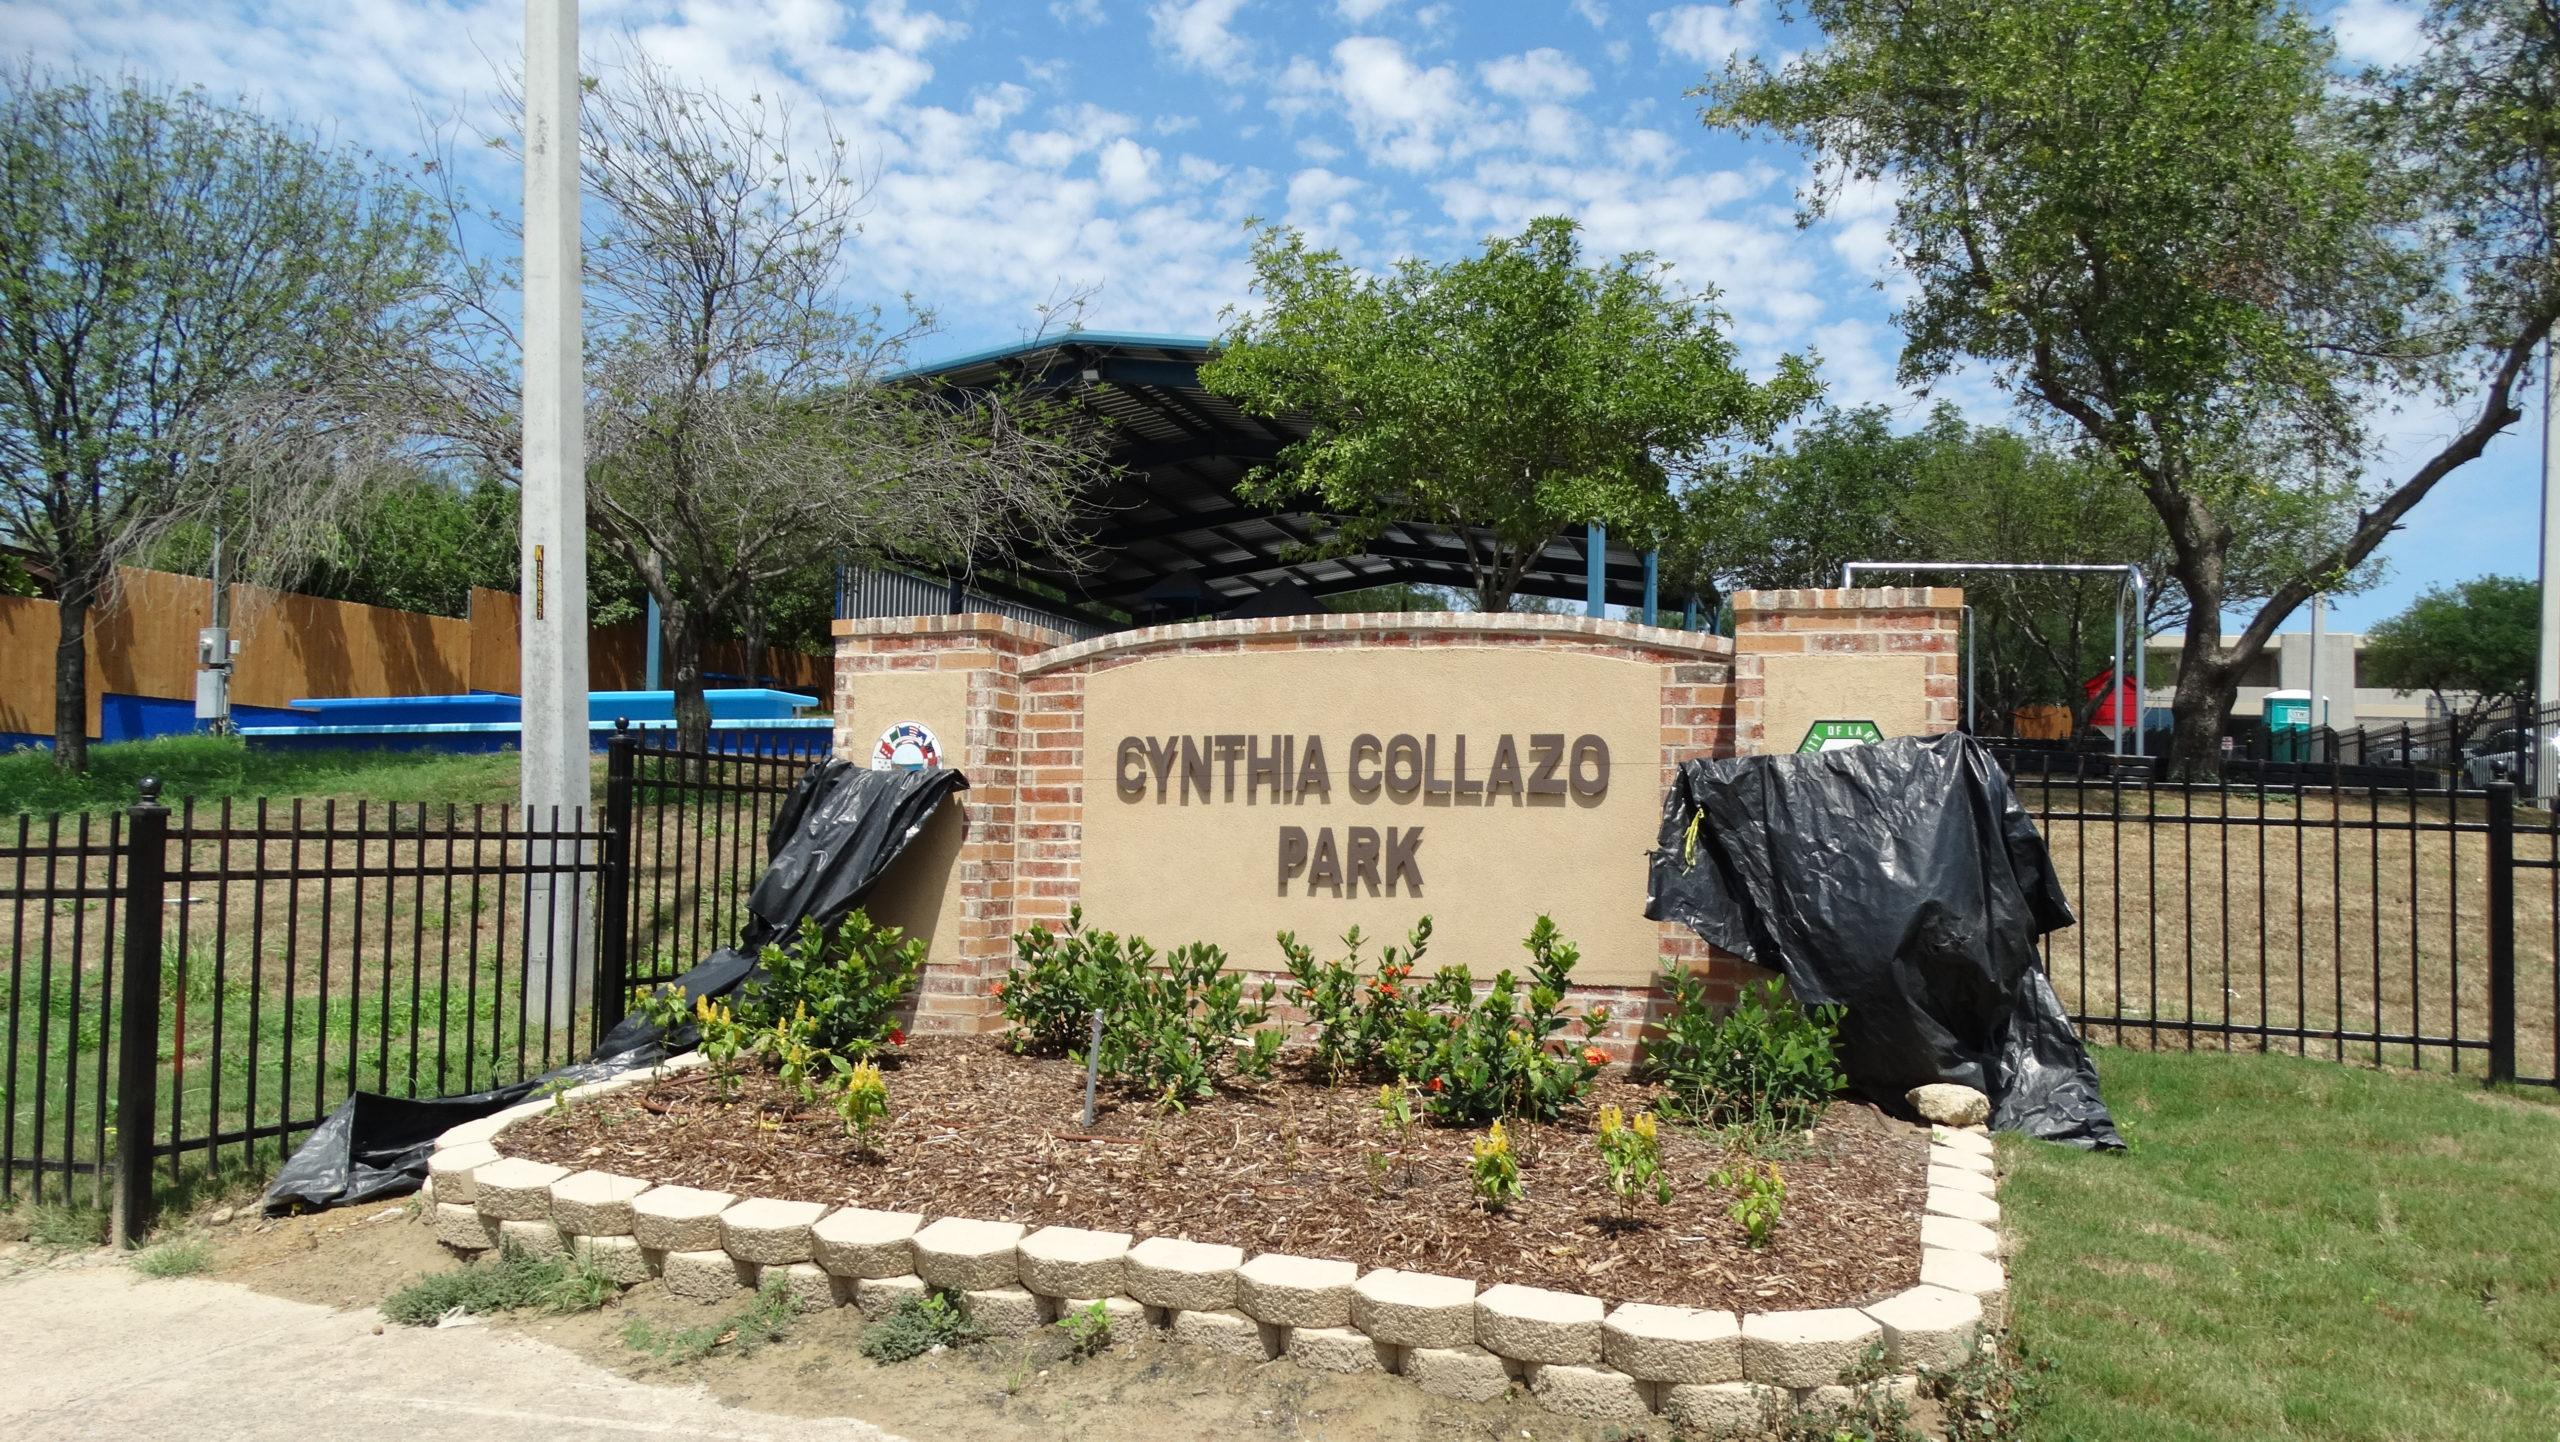 Cynthia Collazo Park